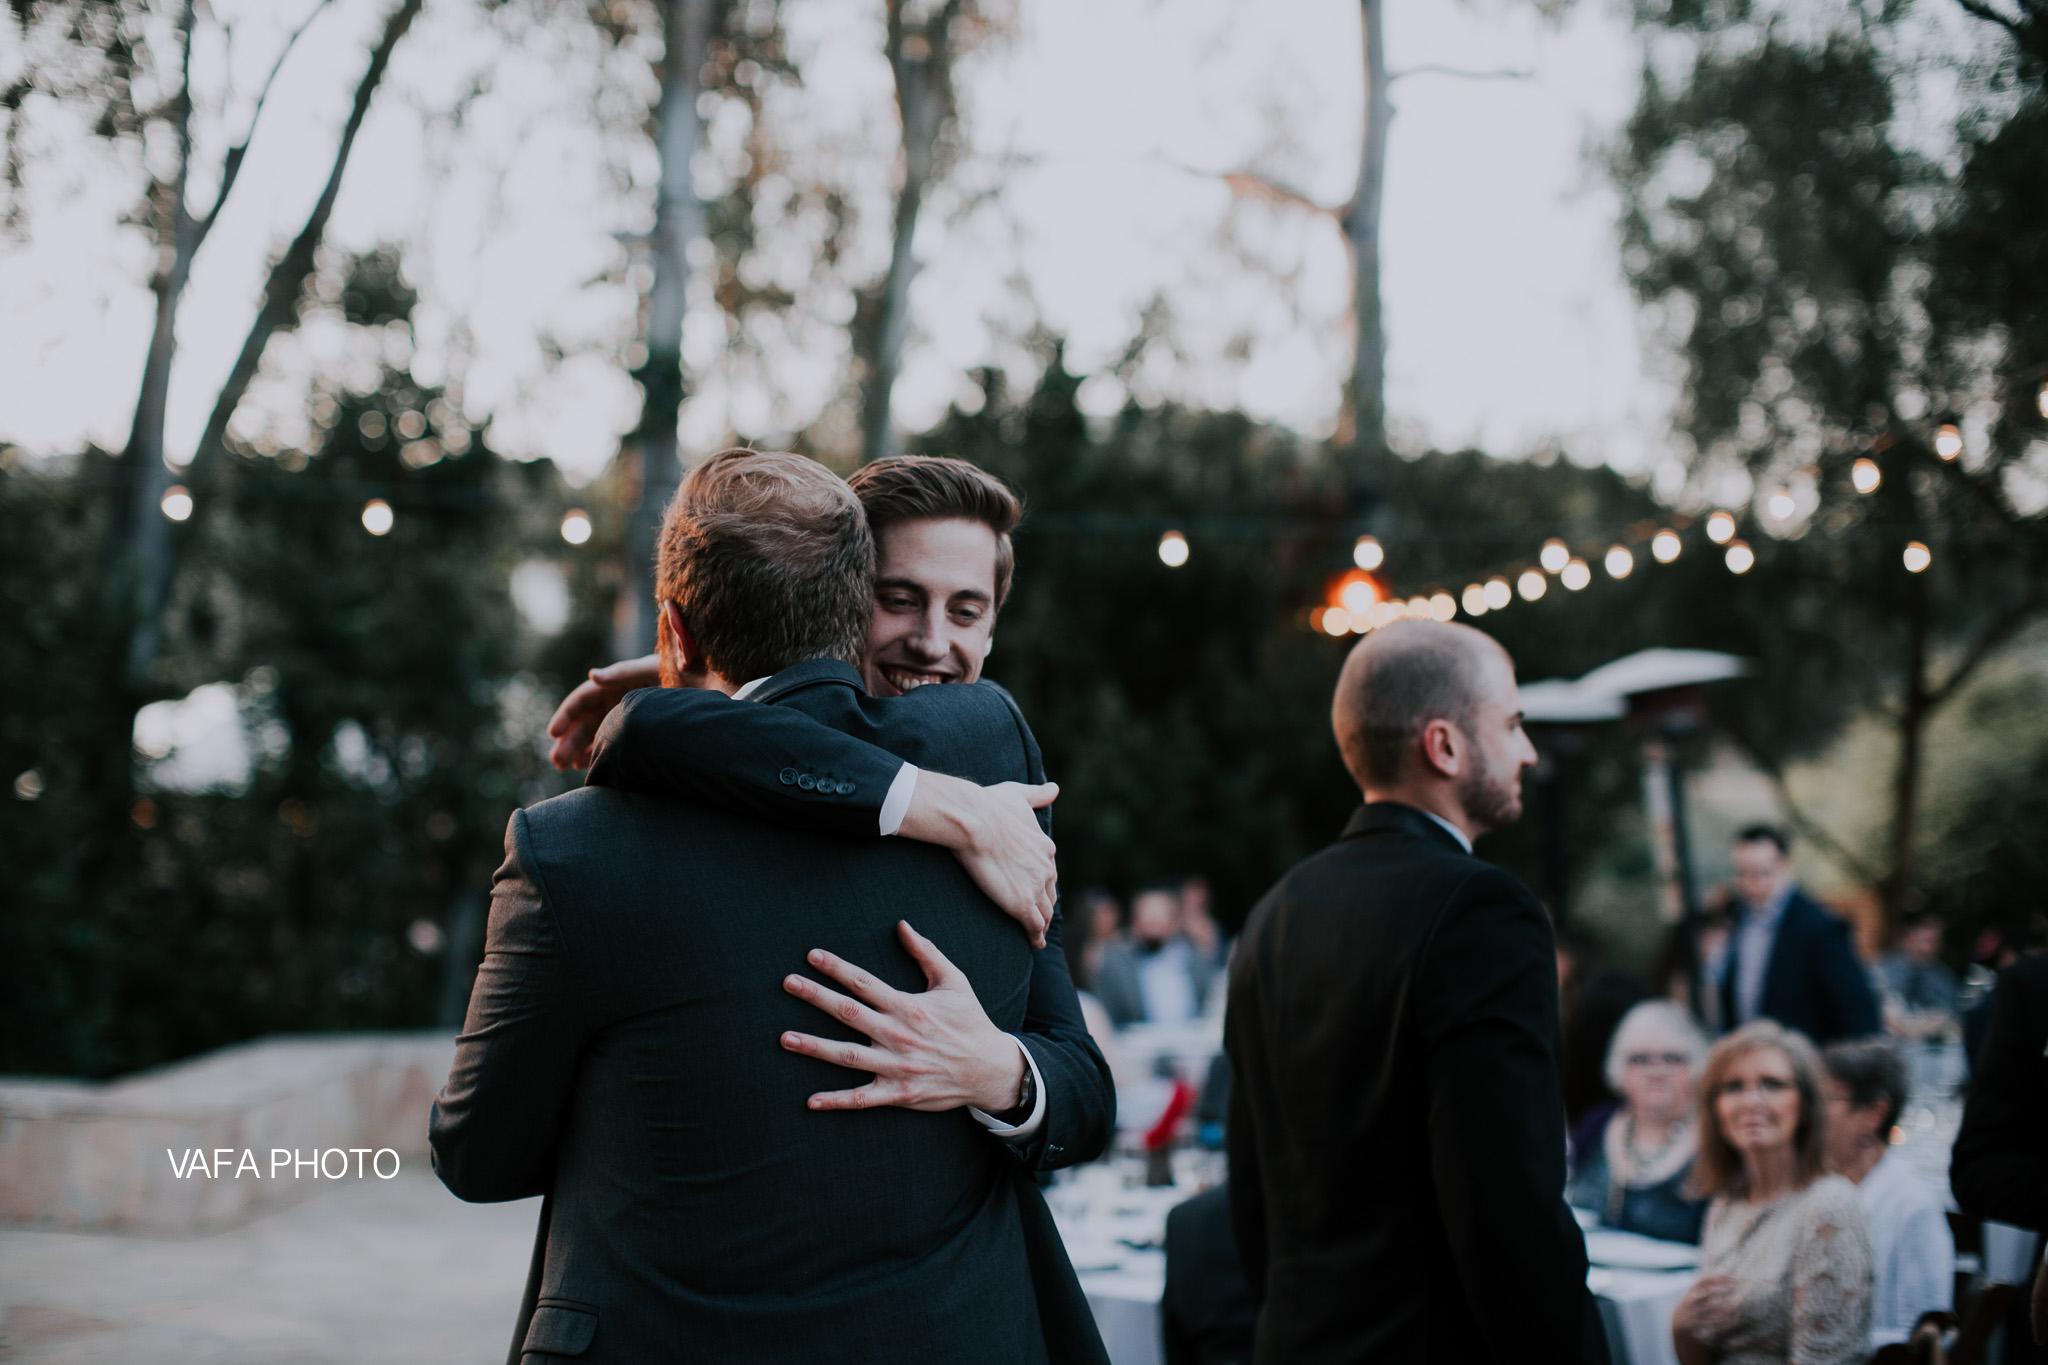 Leo-Carrillo-Ranch-Wedding-Lauren-Mike-Vafa-Photo-1047.jpg